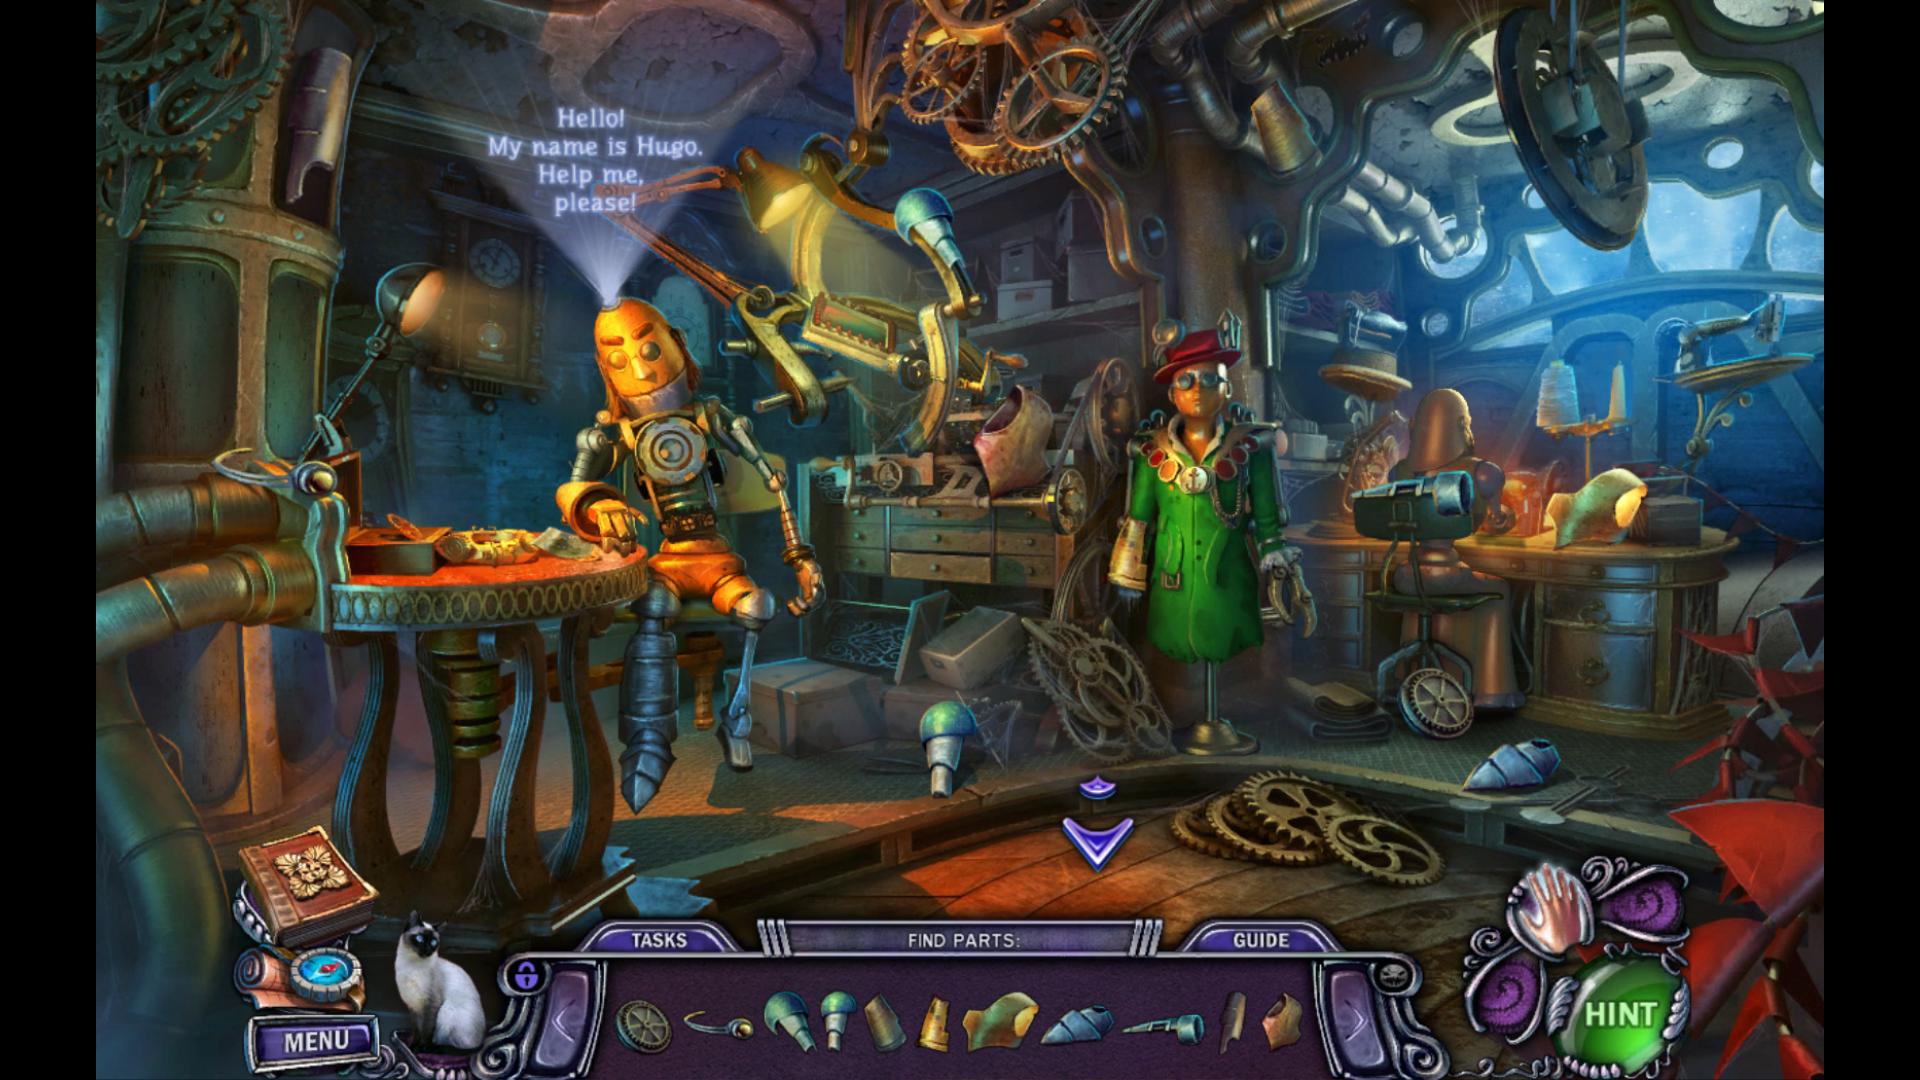 Screenshot from House of 1000 Doors: Evil Inside (6/9)